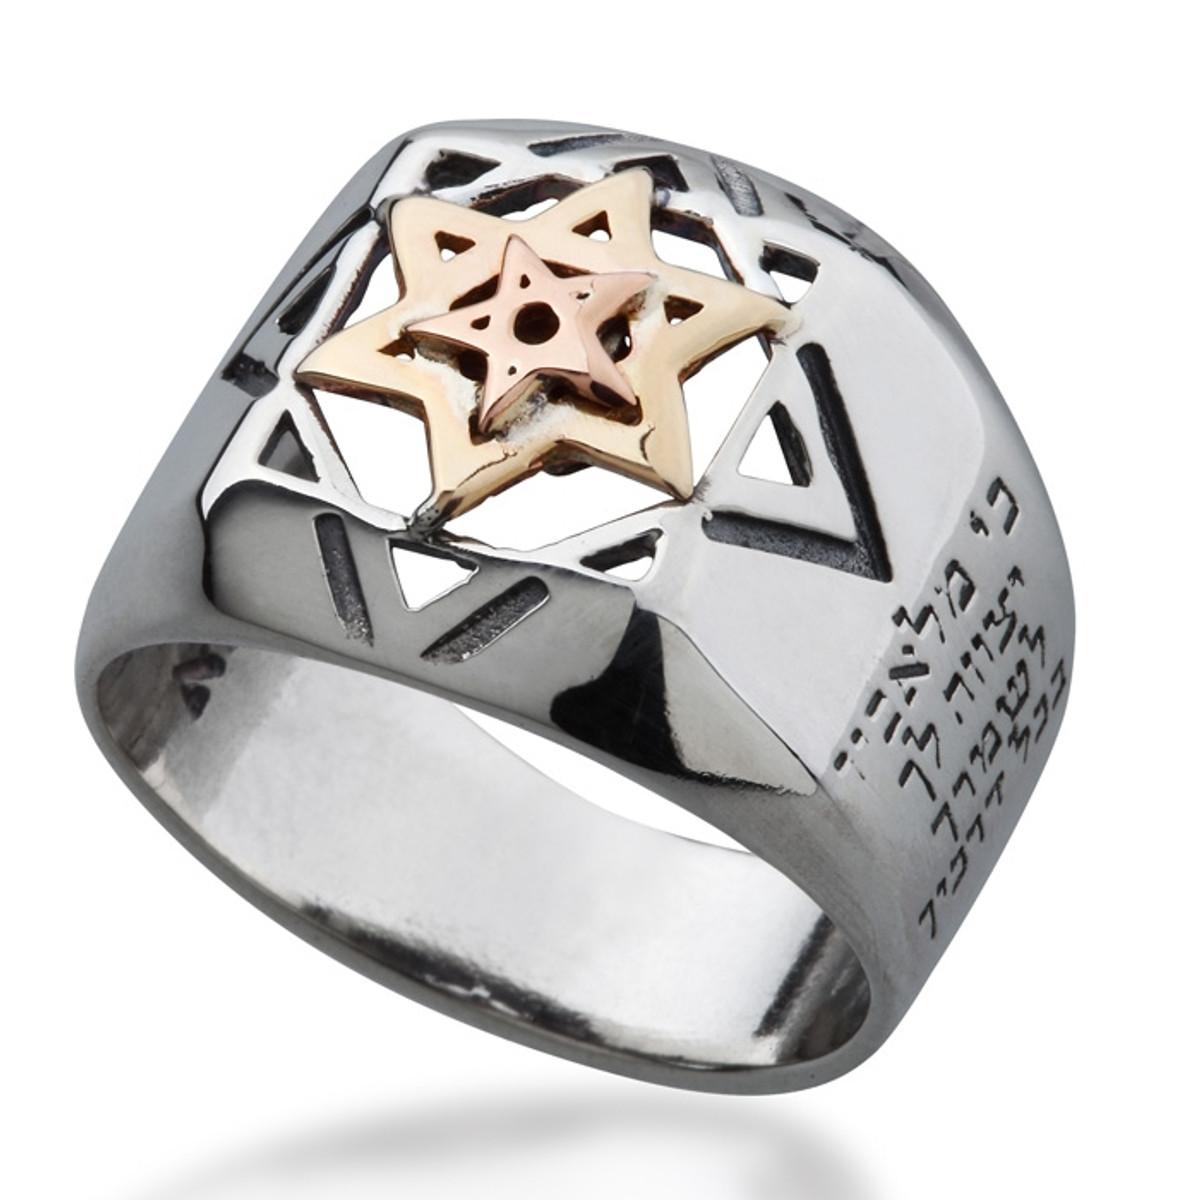 Haari Tikun Five Metals Hava Ring for Blessing and Keepsake